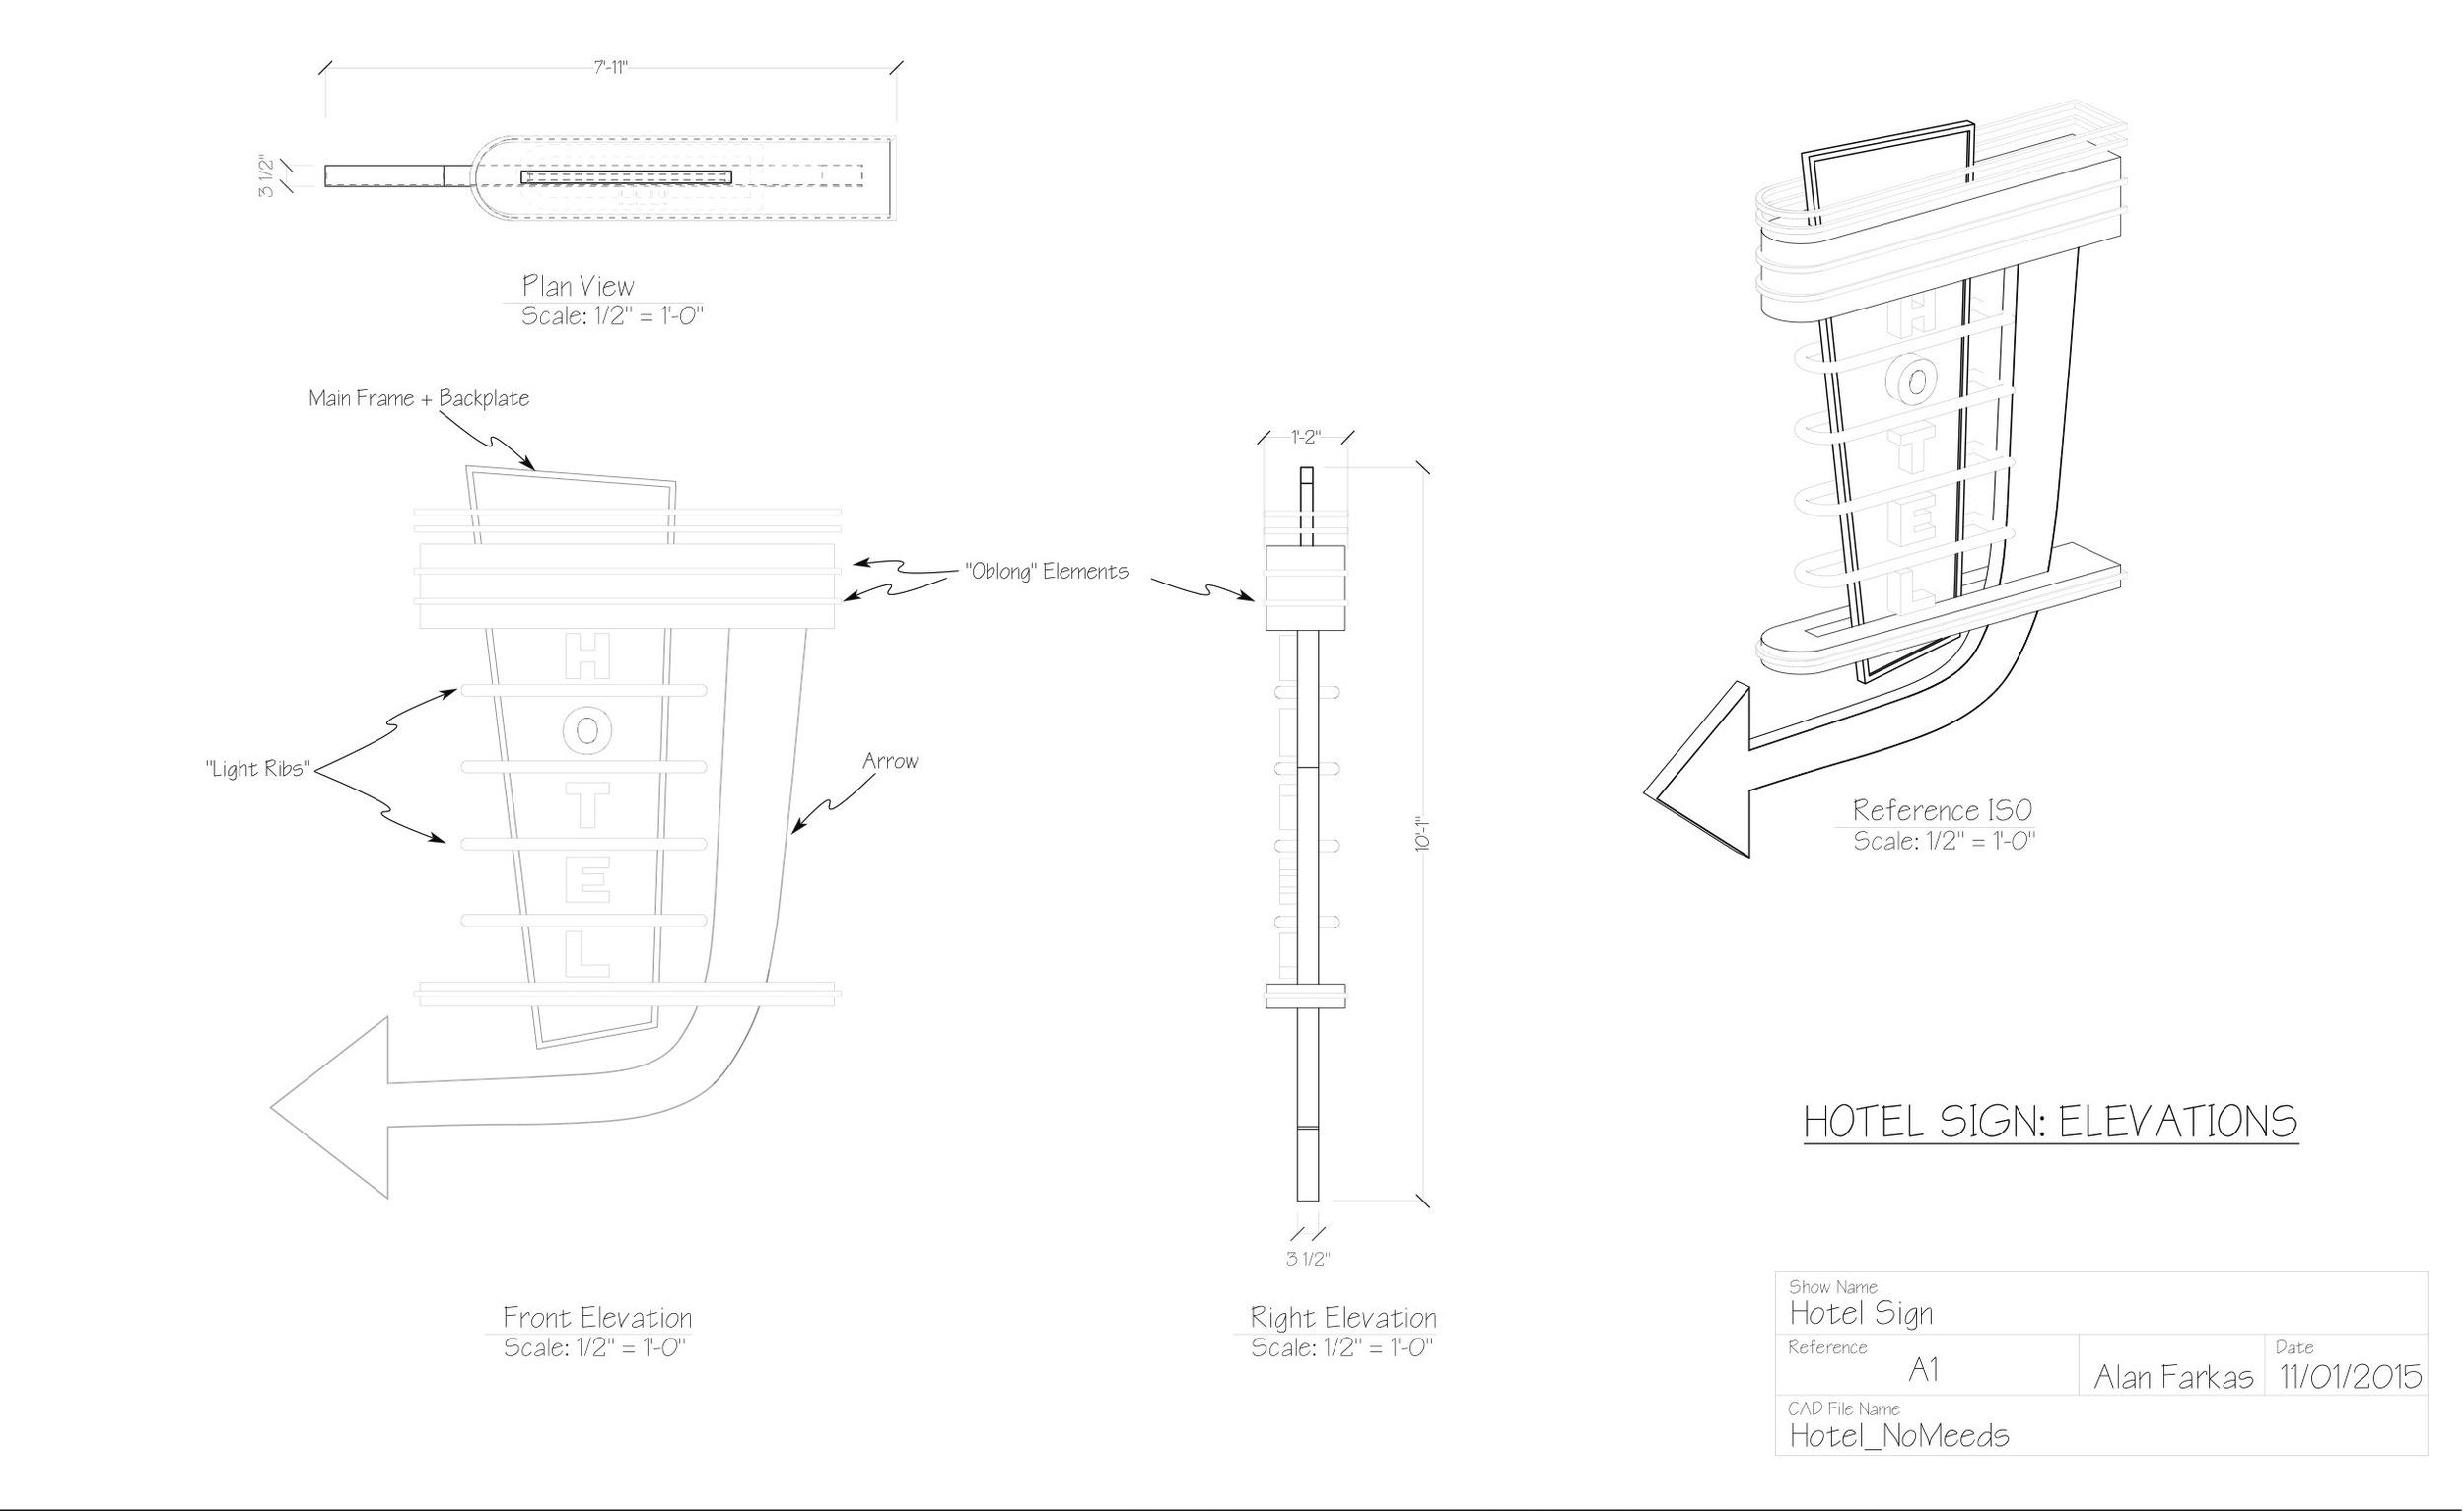 Alan Farkas_3D Set Design + Illustration_Reduced 11.jpeg